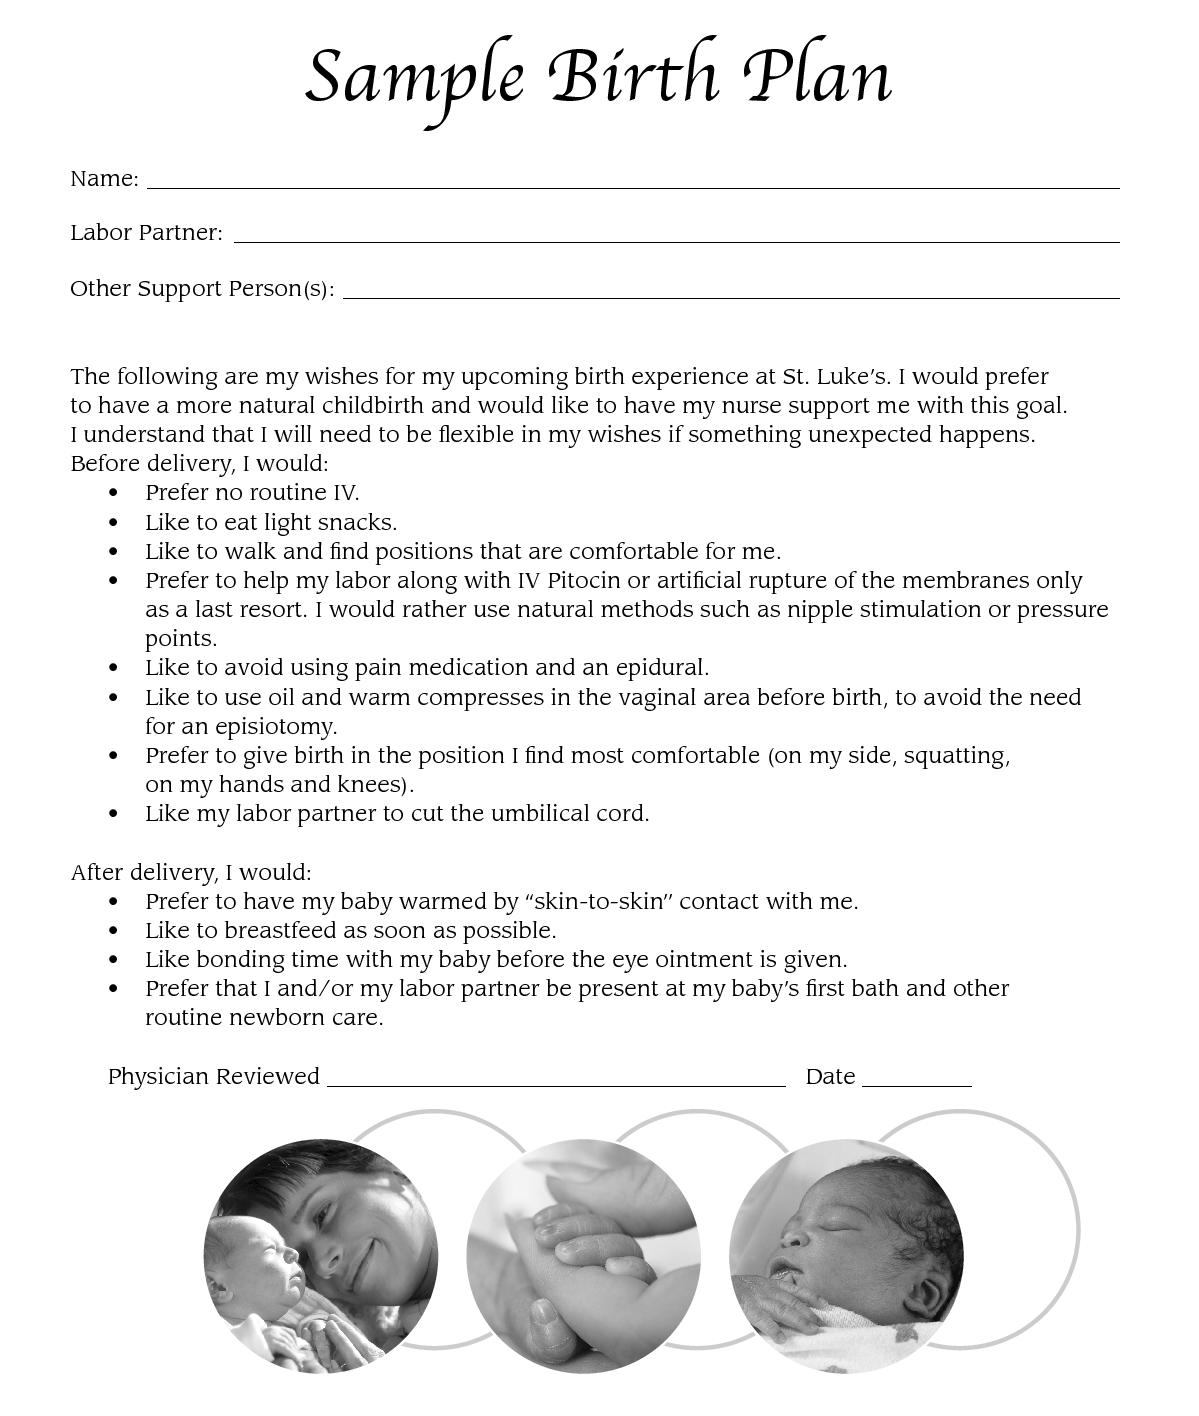 Sample Birth Plan